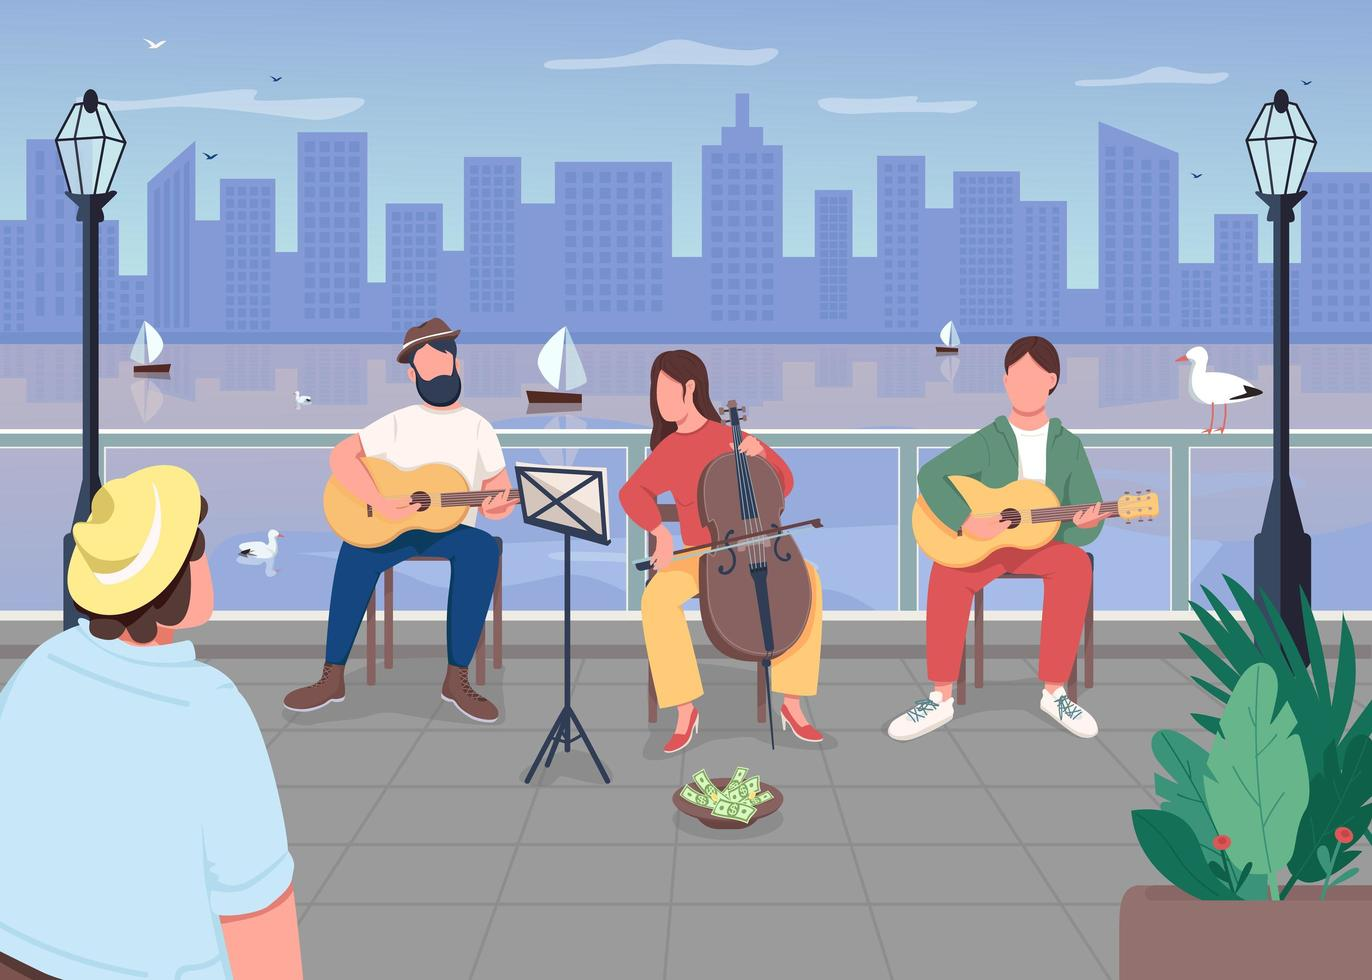 Musikband in der Stadt vektor